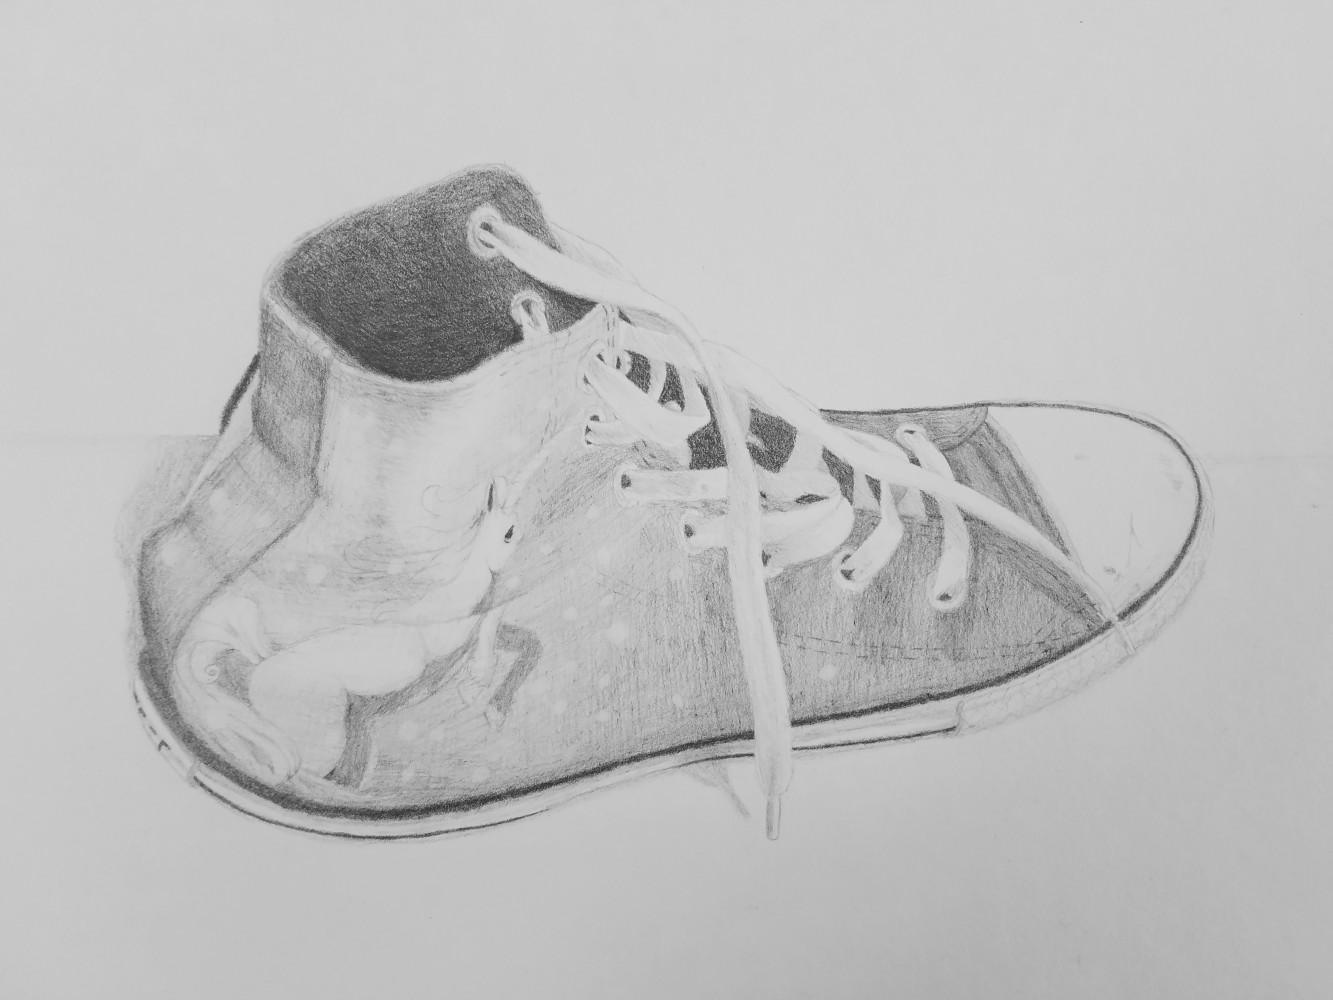 Converse by Kiaboo